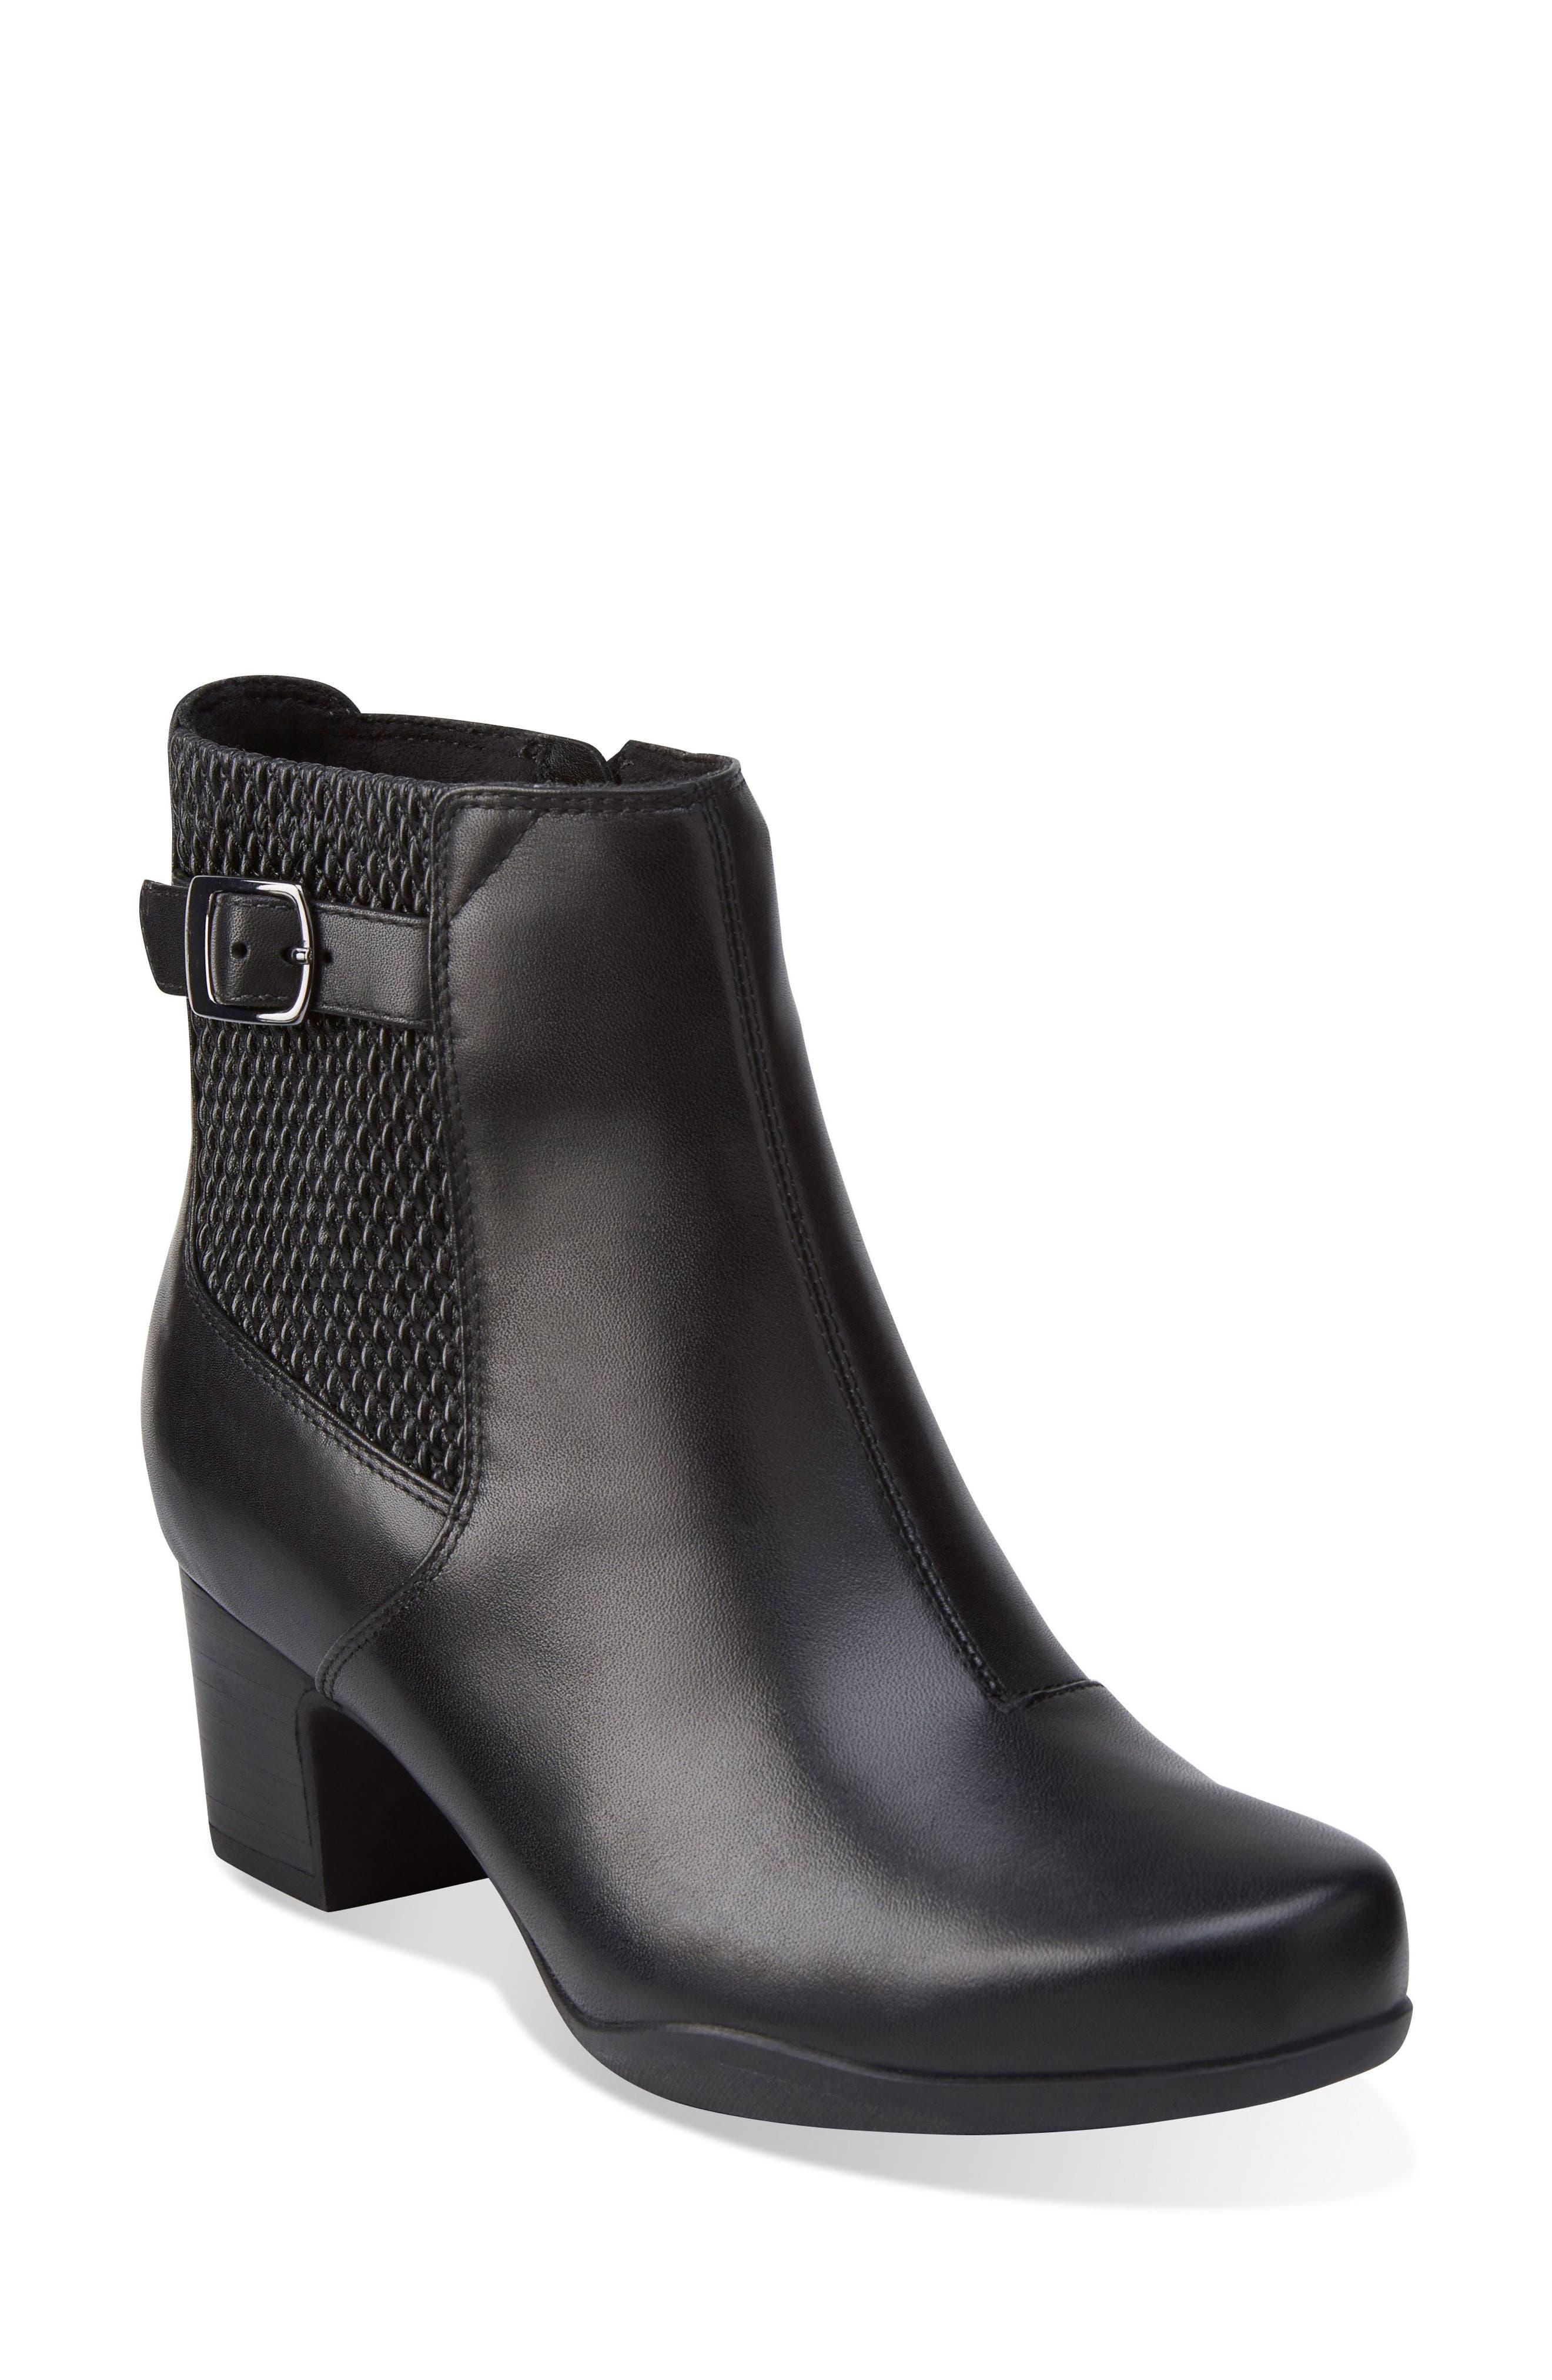 Rosalyn Lara Waterproof Boot,                             Main thumbnail 1, color,                             Black Leather